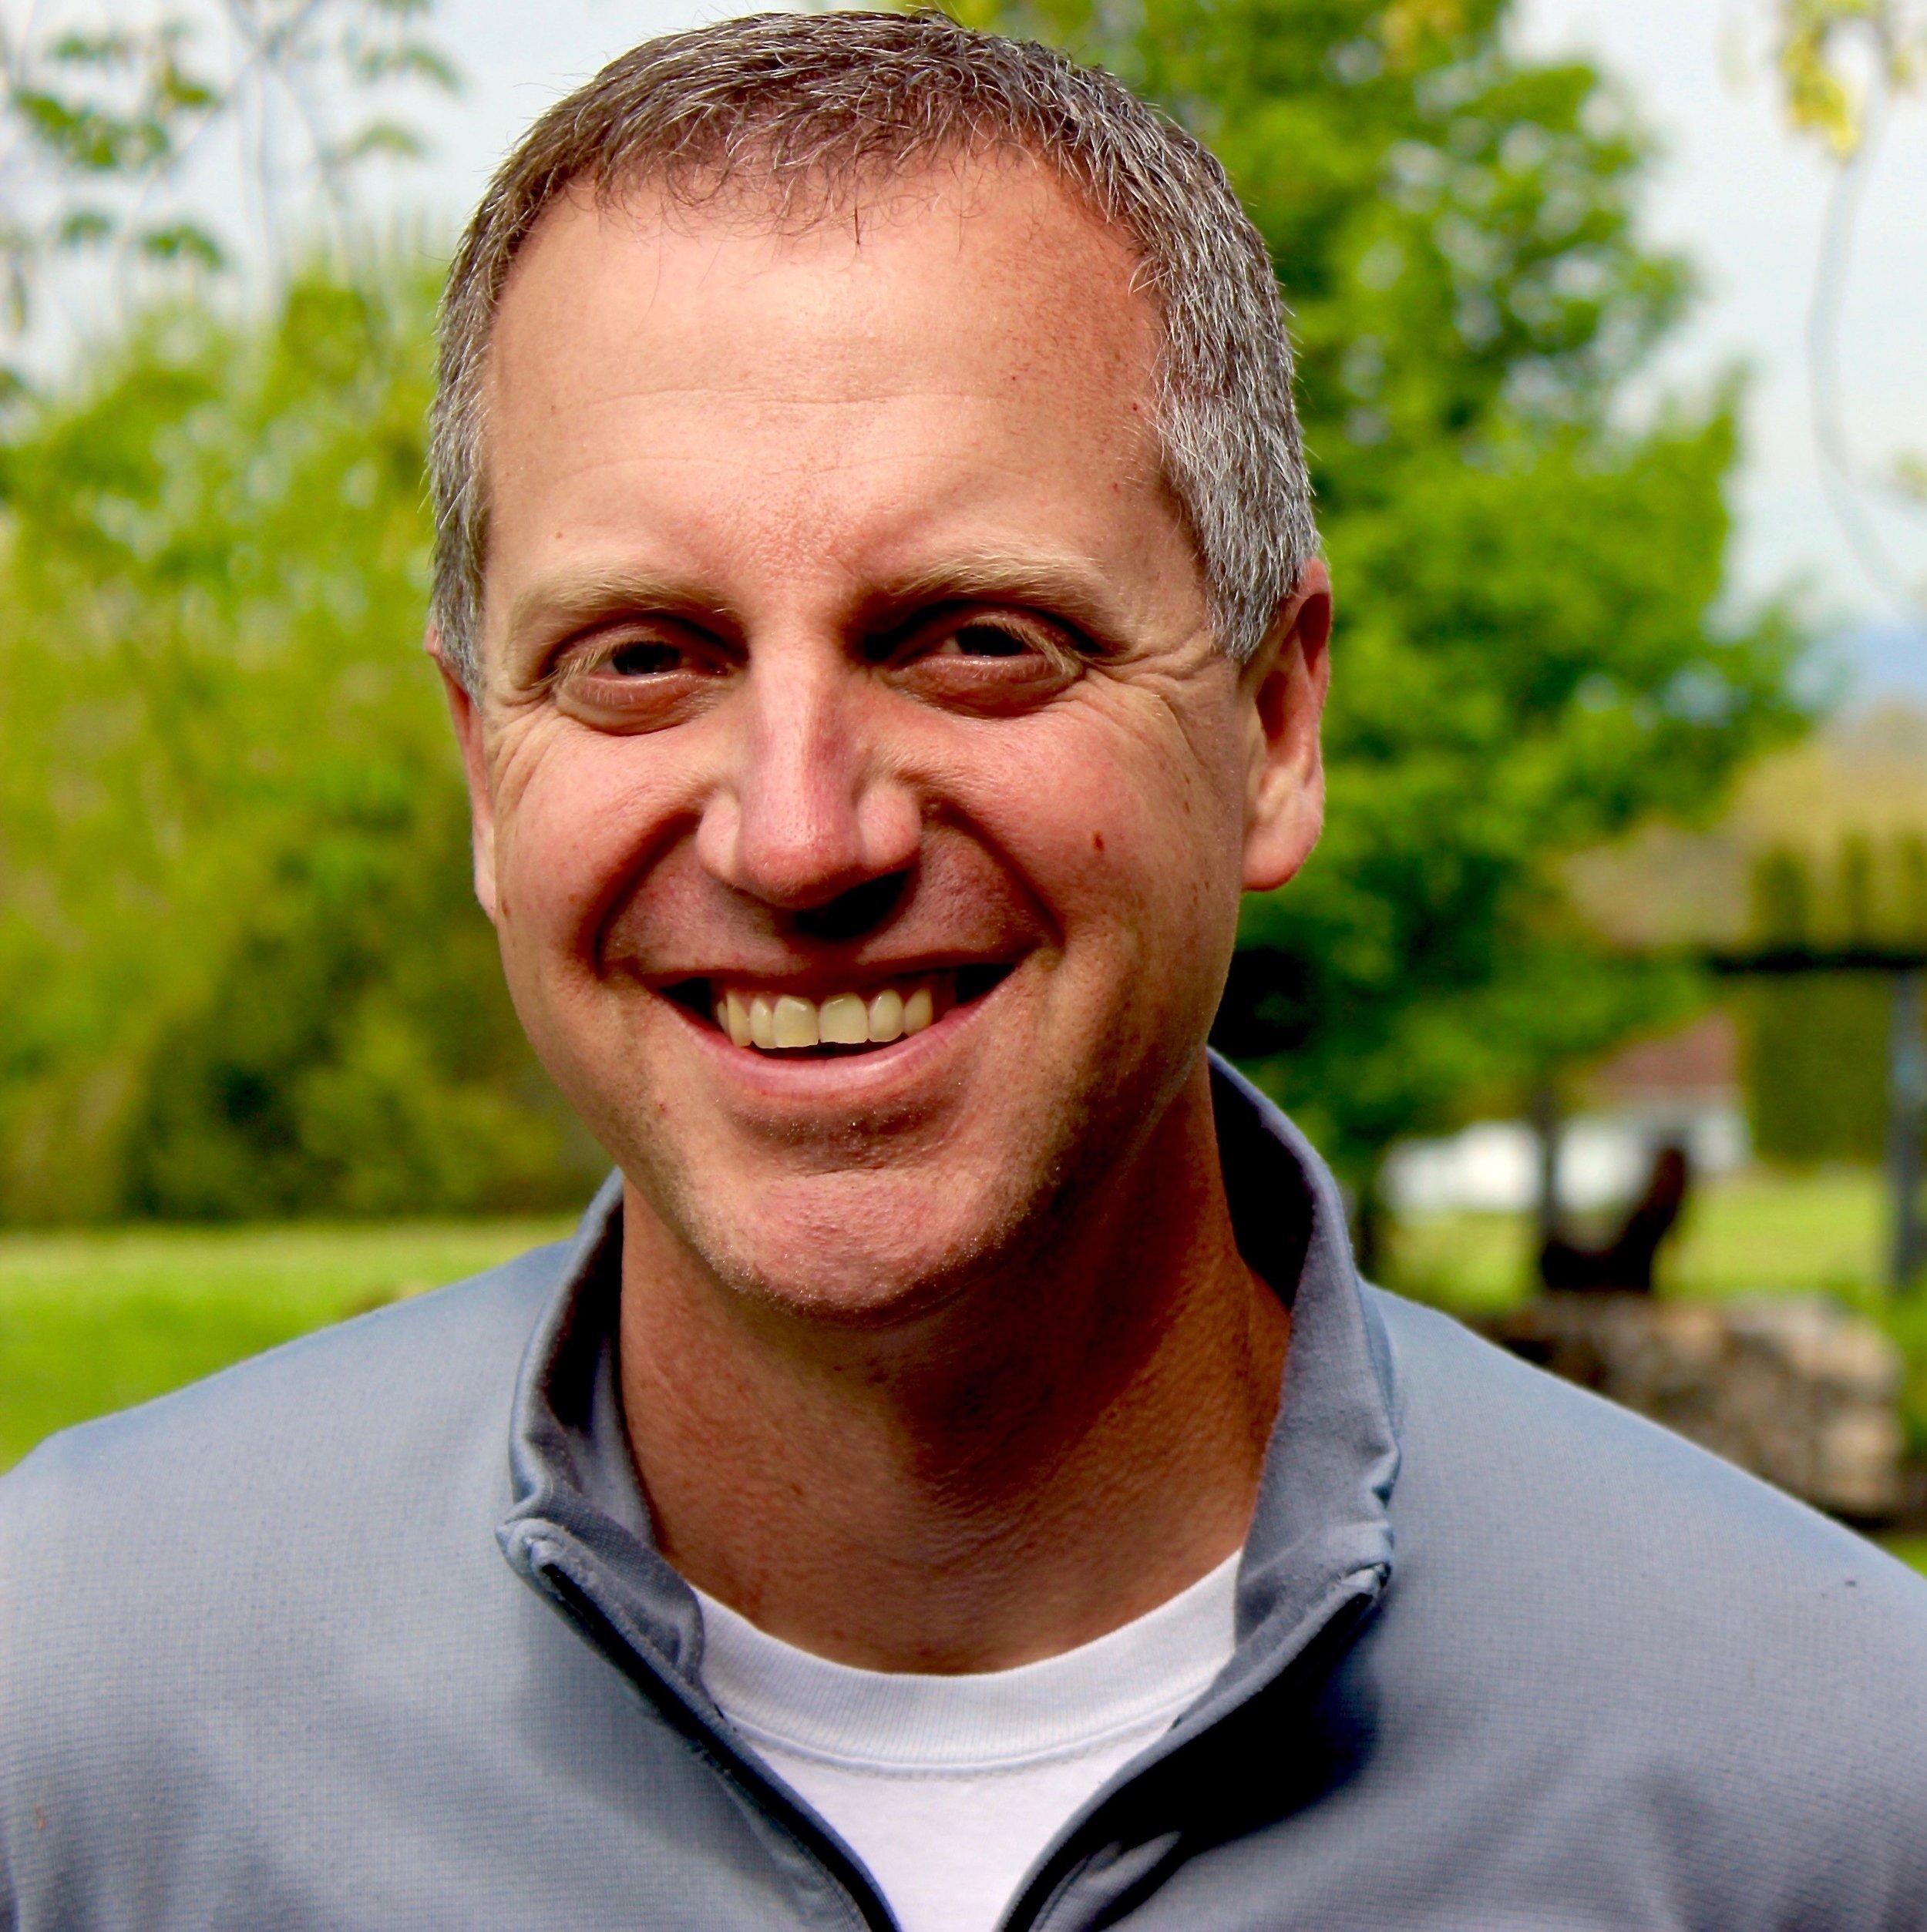 Chris Priestaf - Lead PastorMount Bethel Lutheran Brethren ChurchMount Bethel, PA